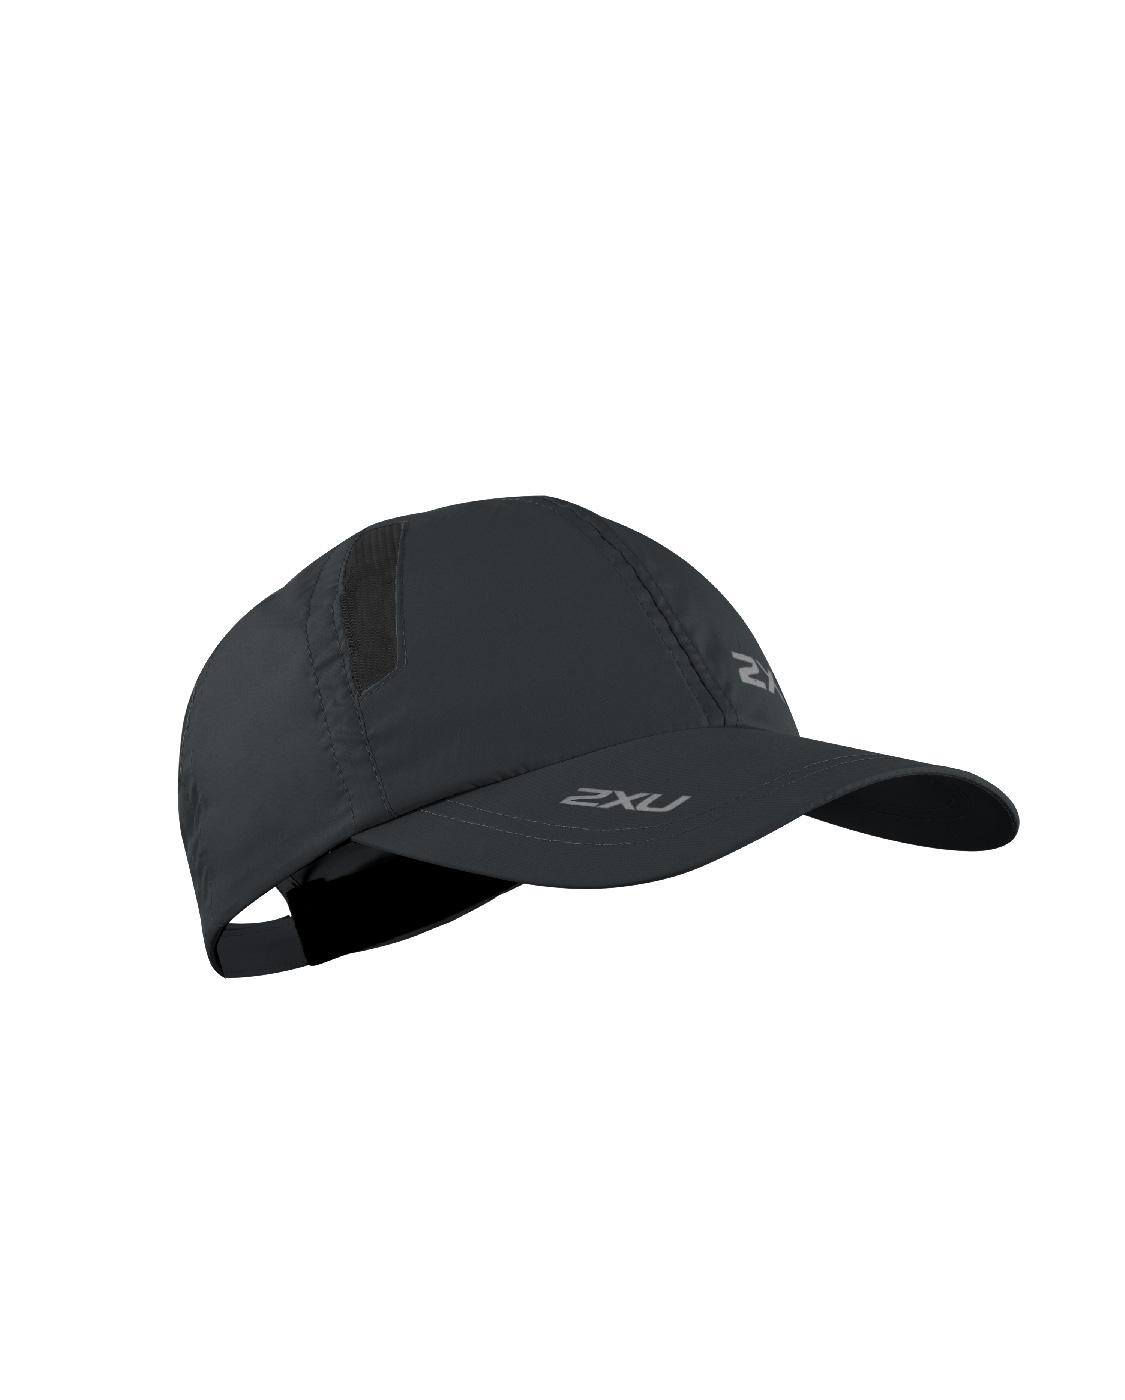 2XU Unisex Run Cap - Black/Black